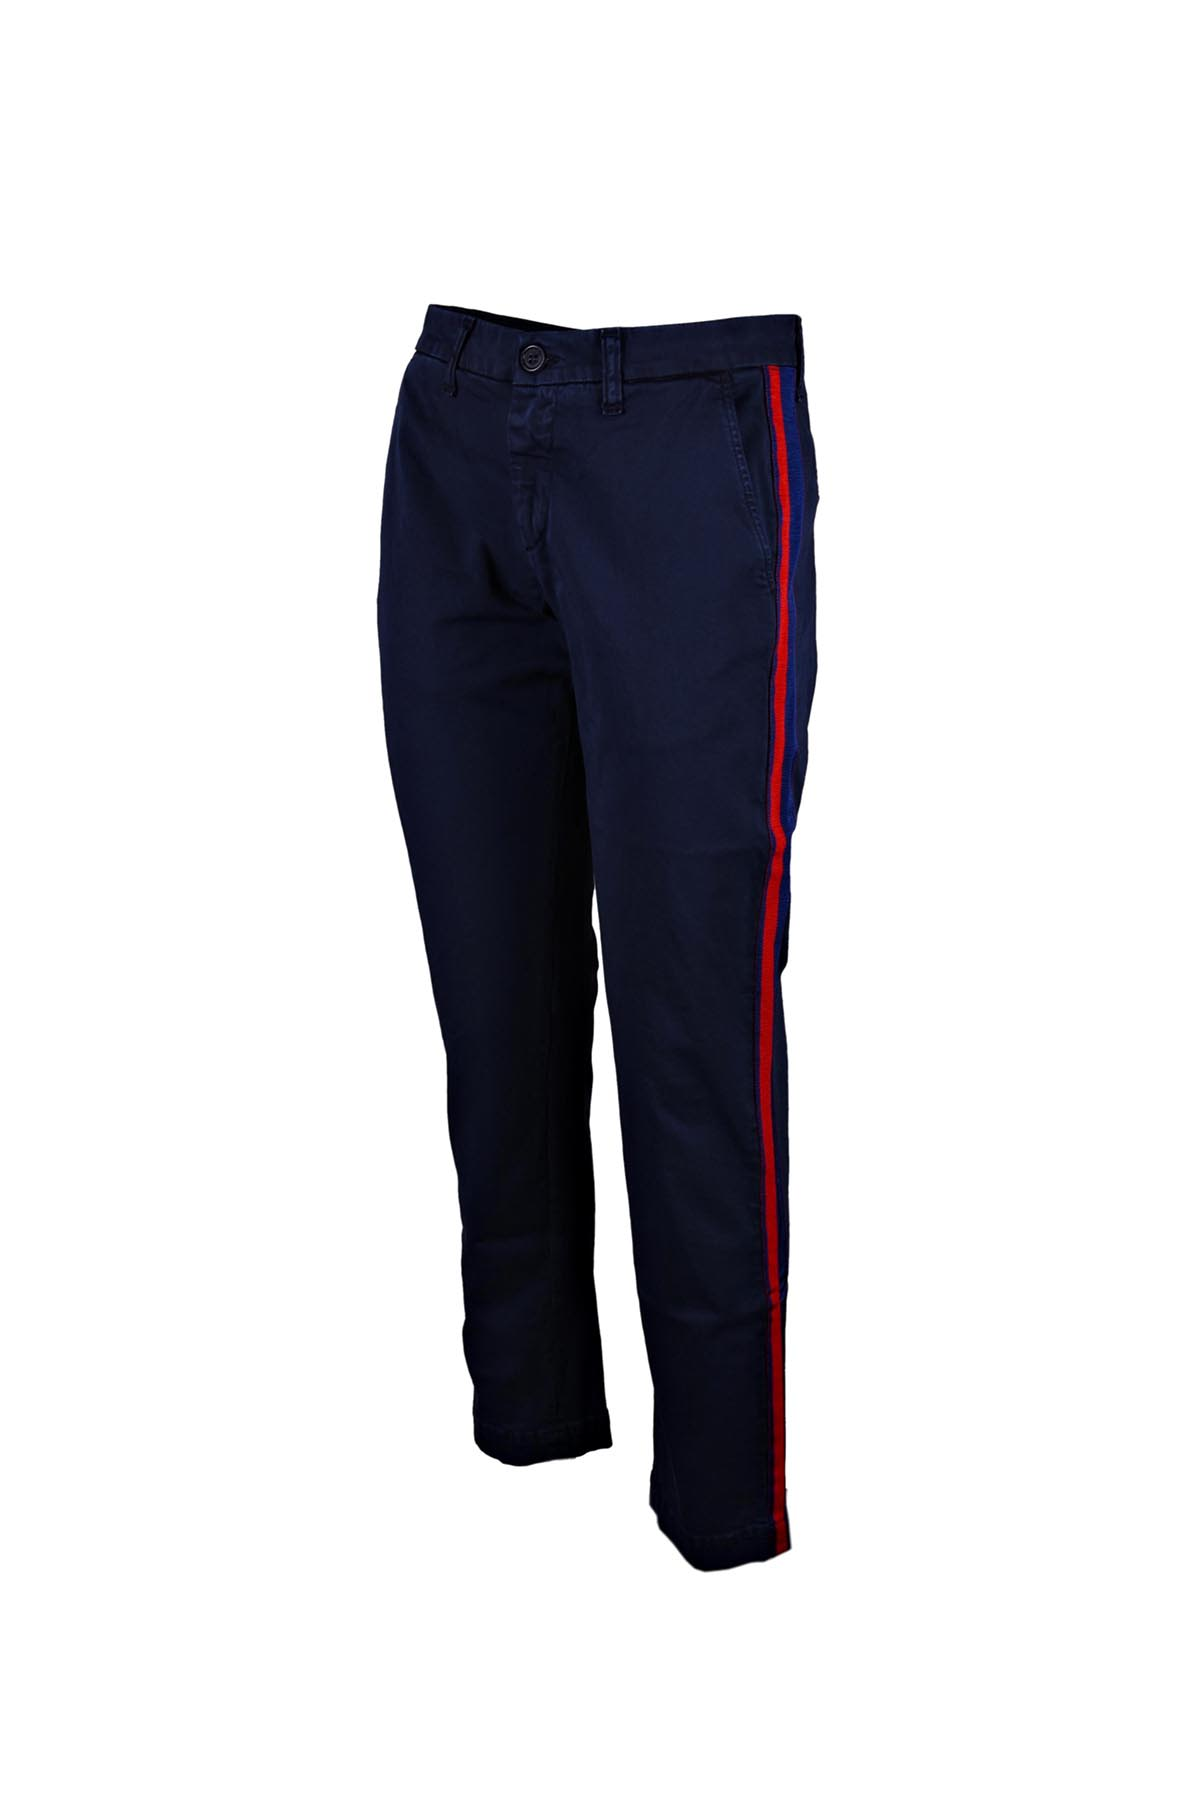 Parosh Pants